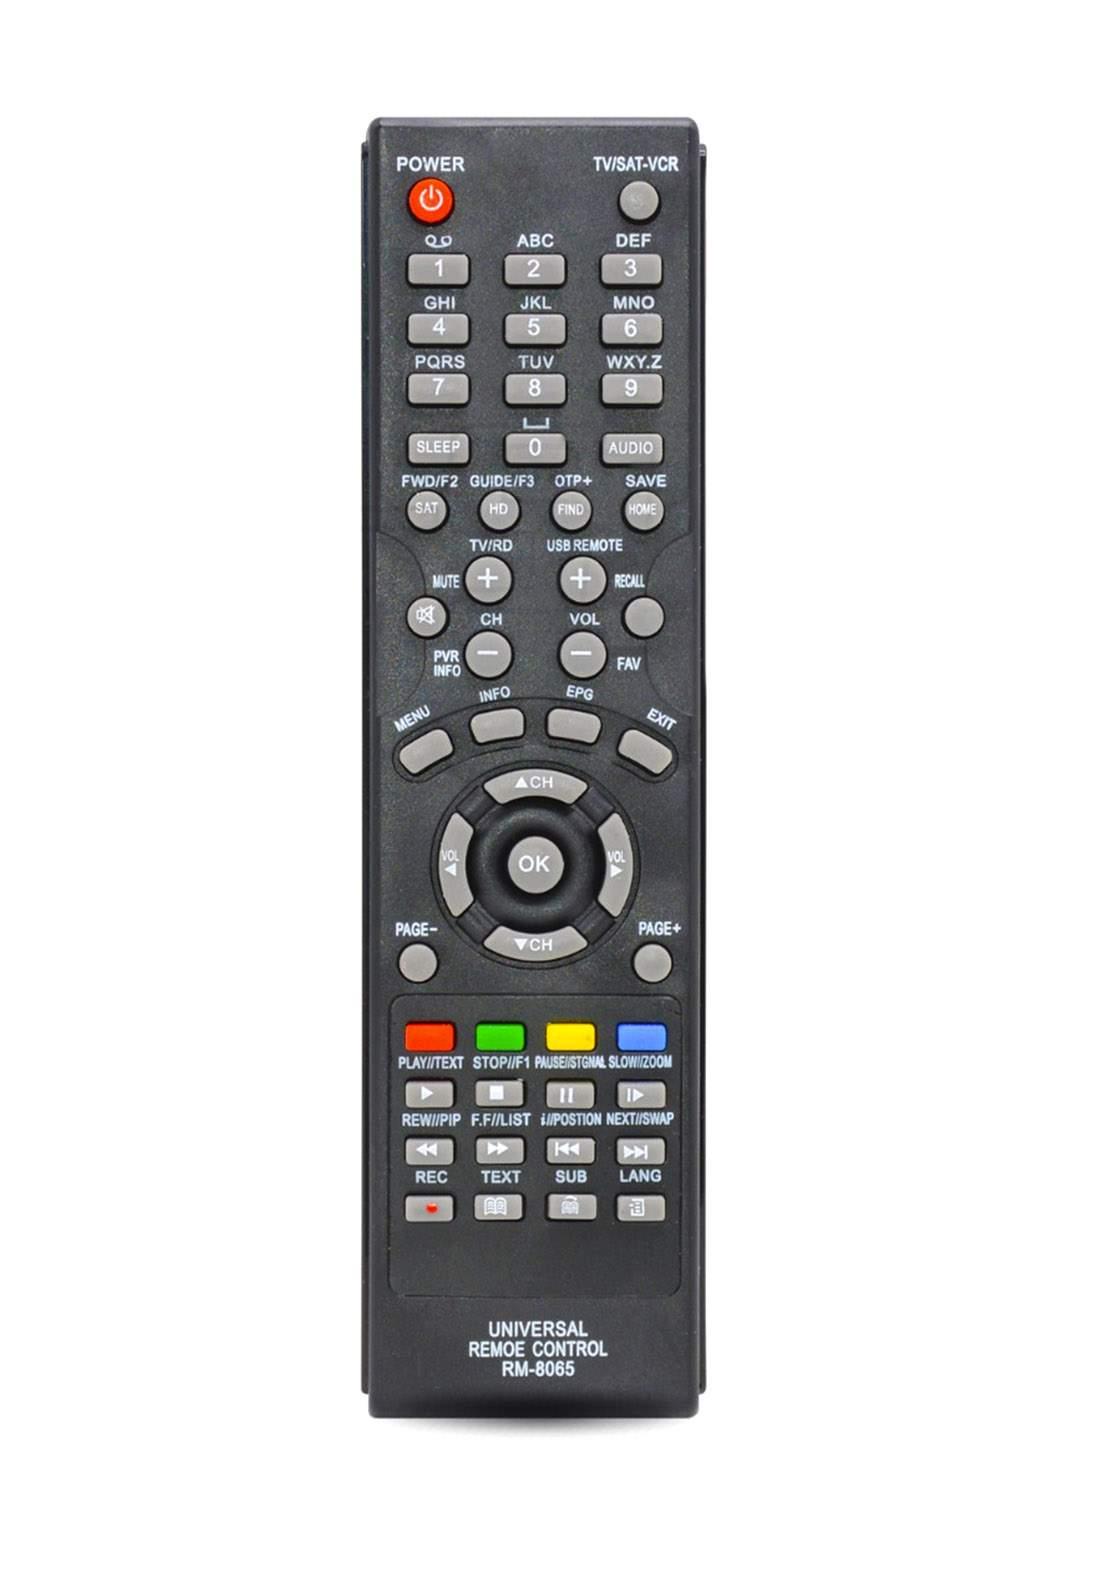 Universal Remote Control For X3 - Black جهاز التحكم عن بعد